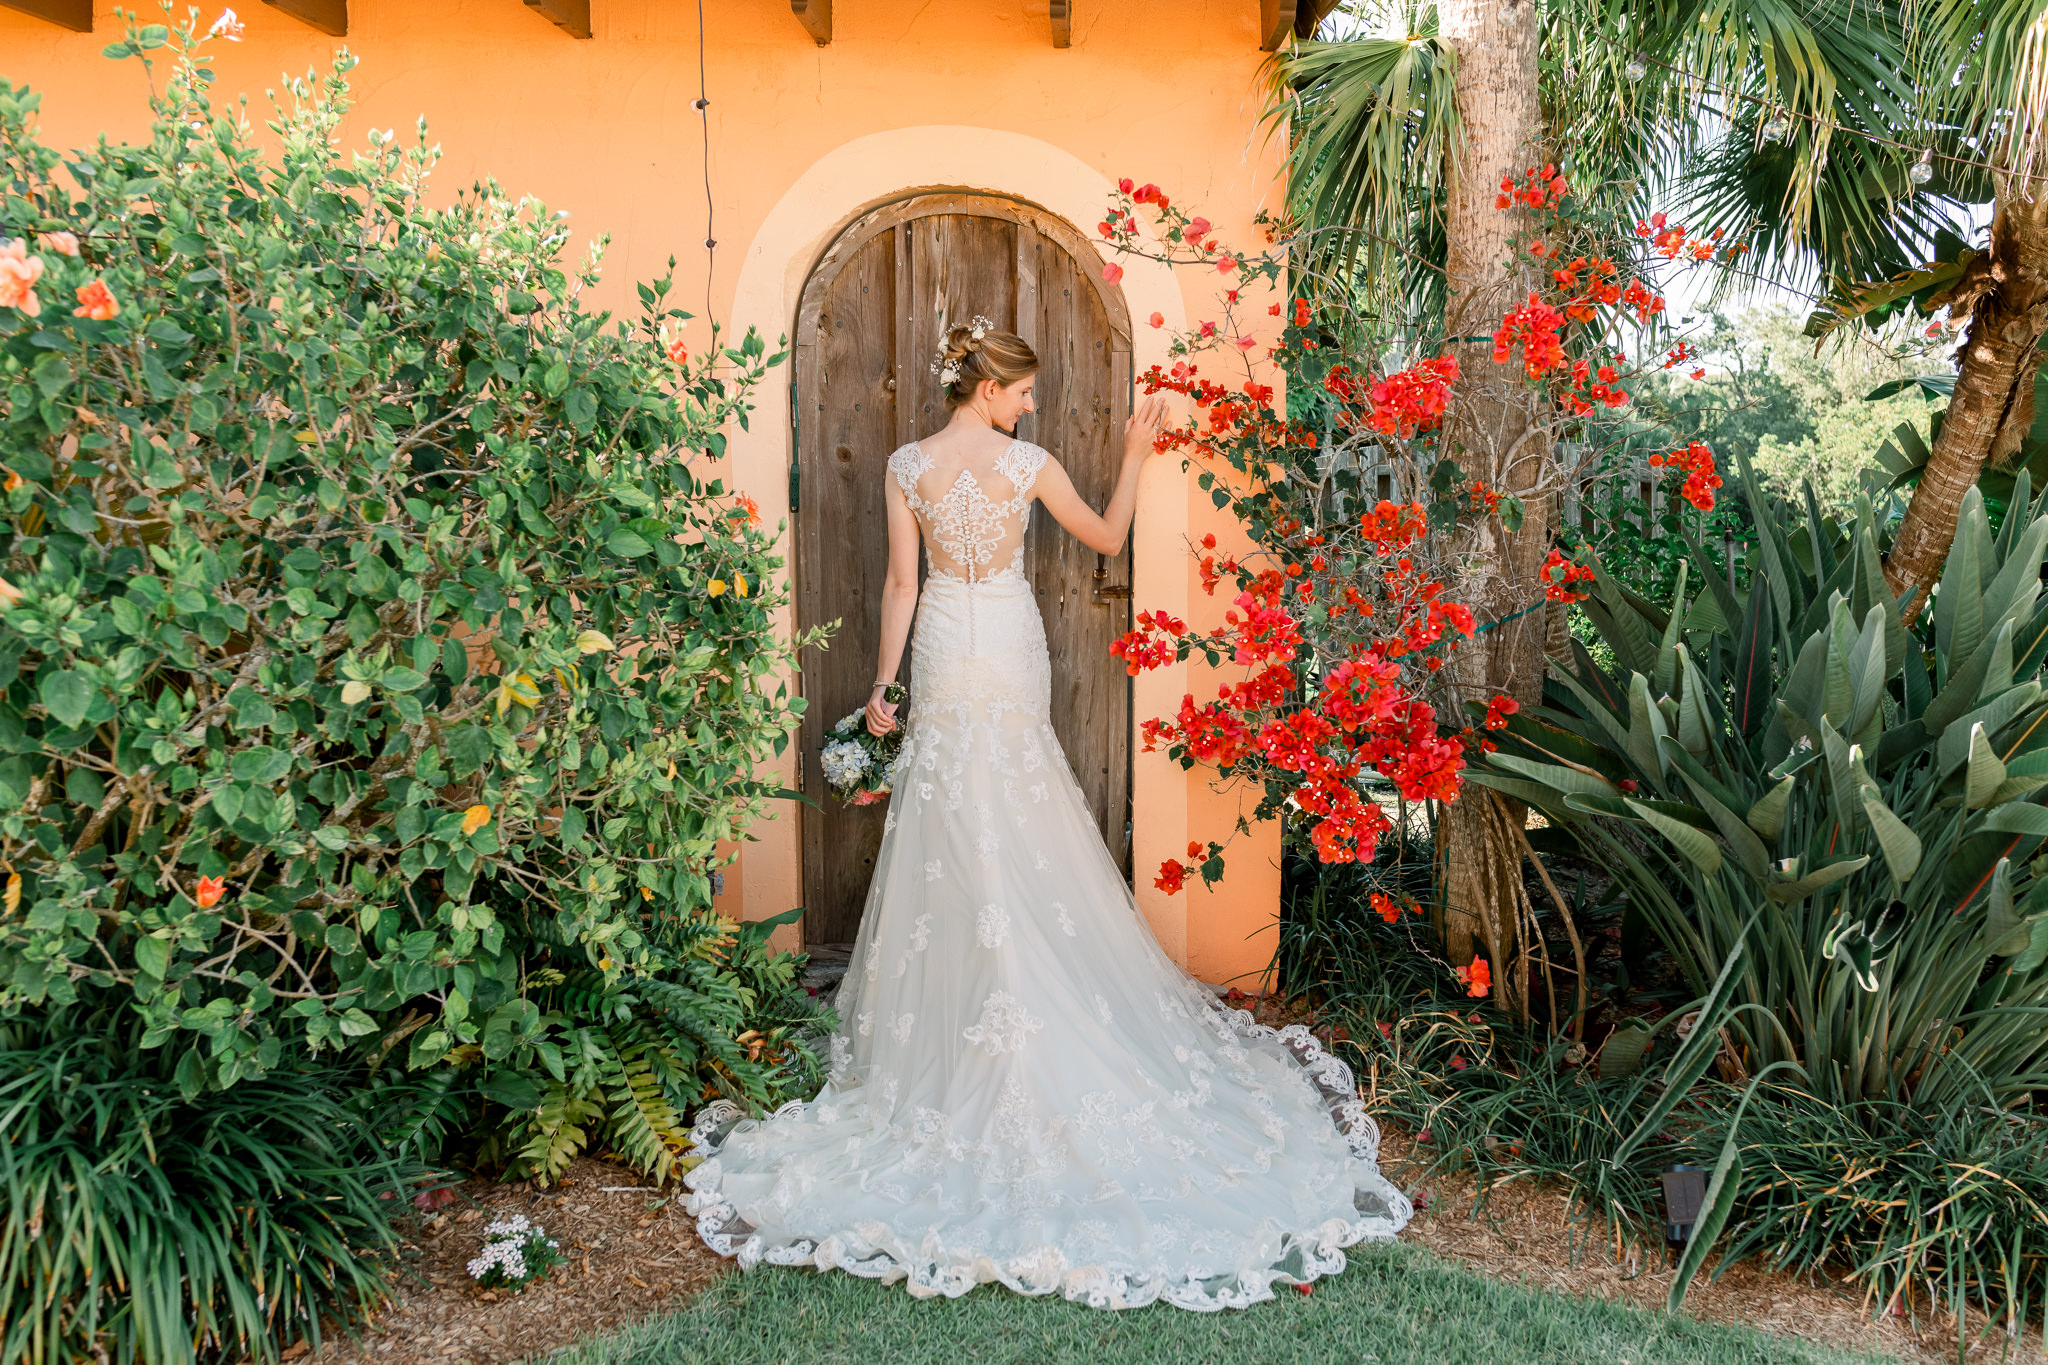 SARASOTA_WEDDING_PHOTOGRAPHY_SMMZ_4250.jpg